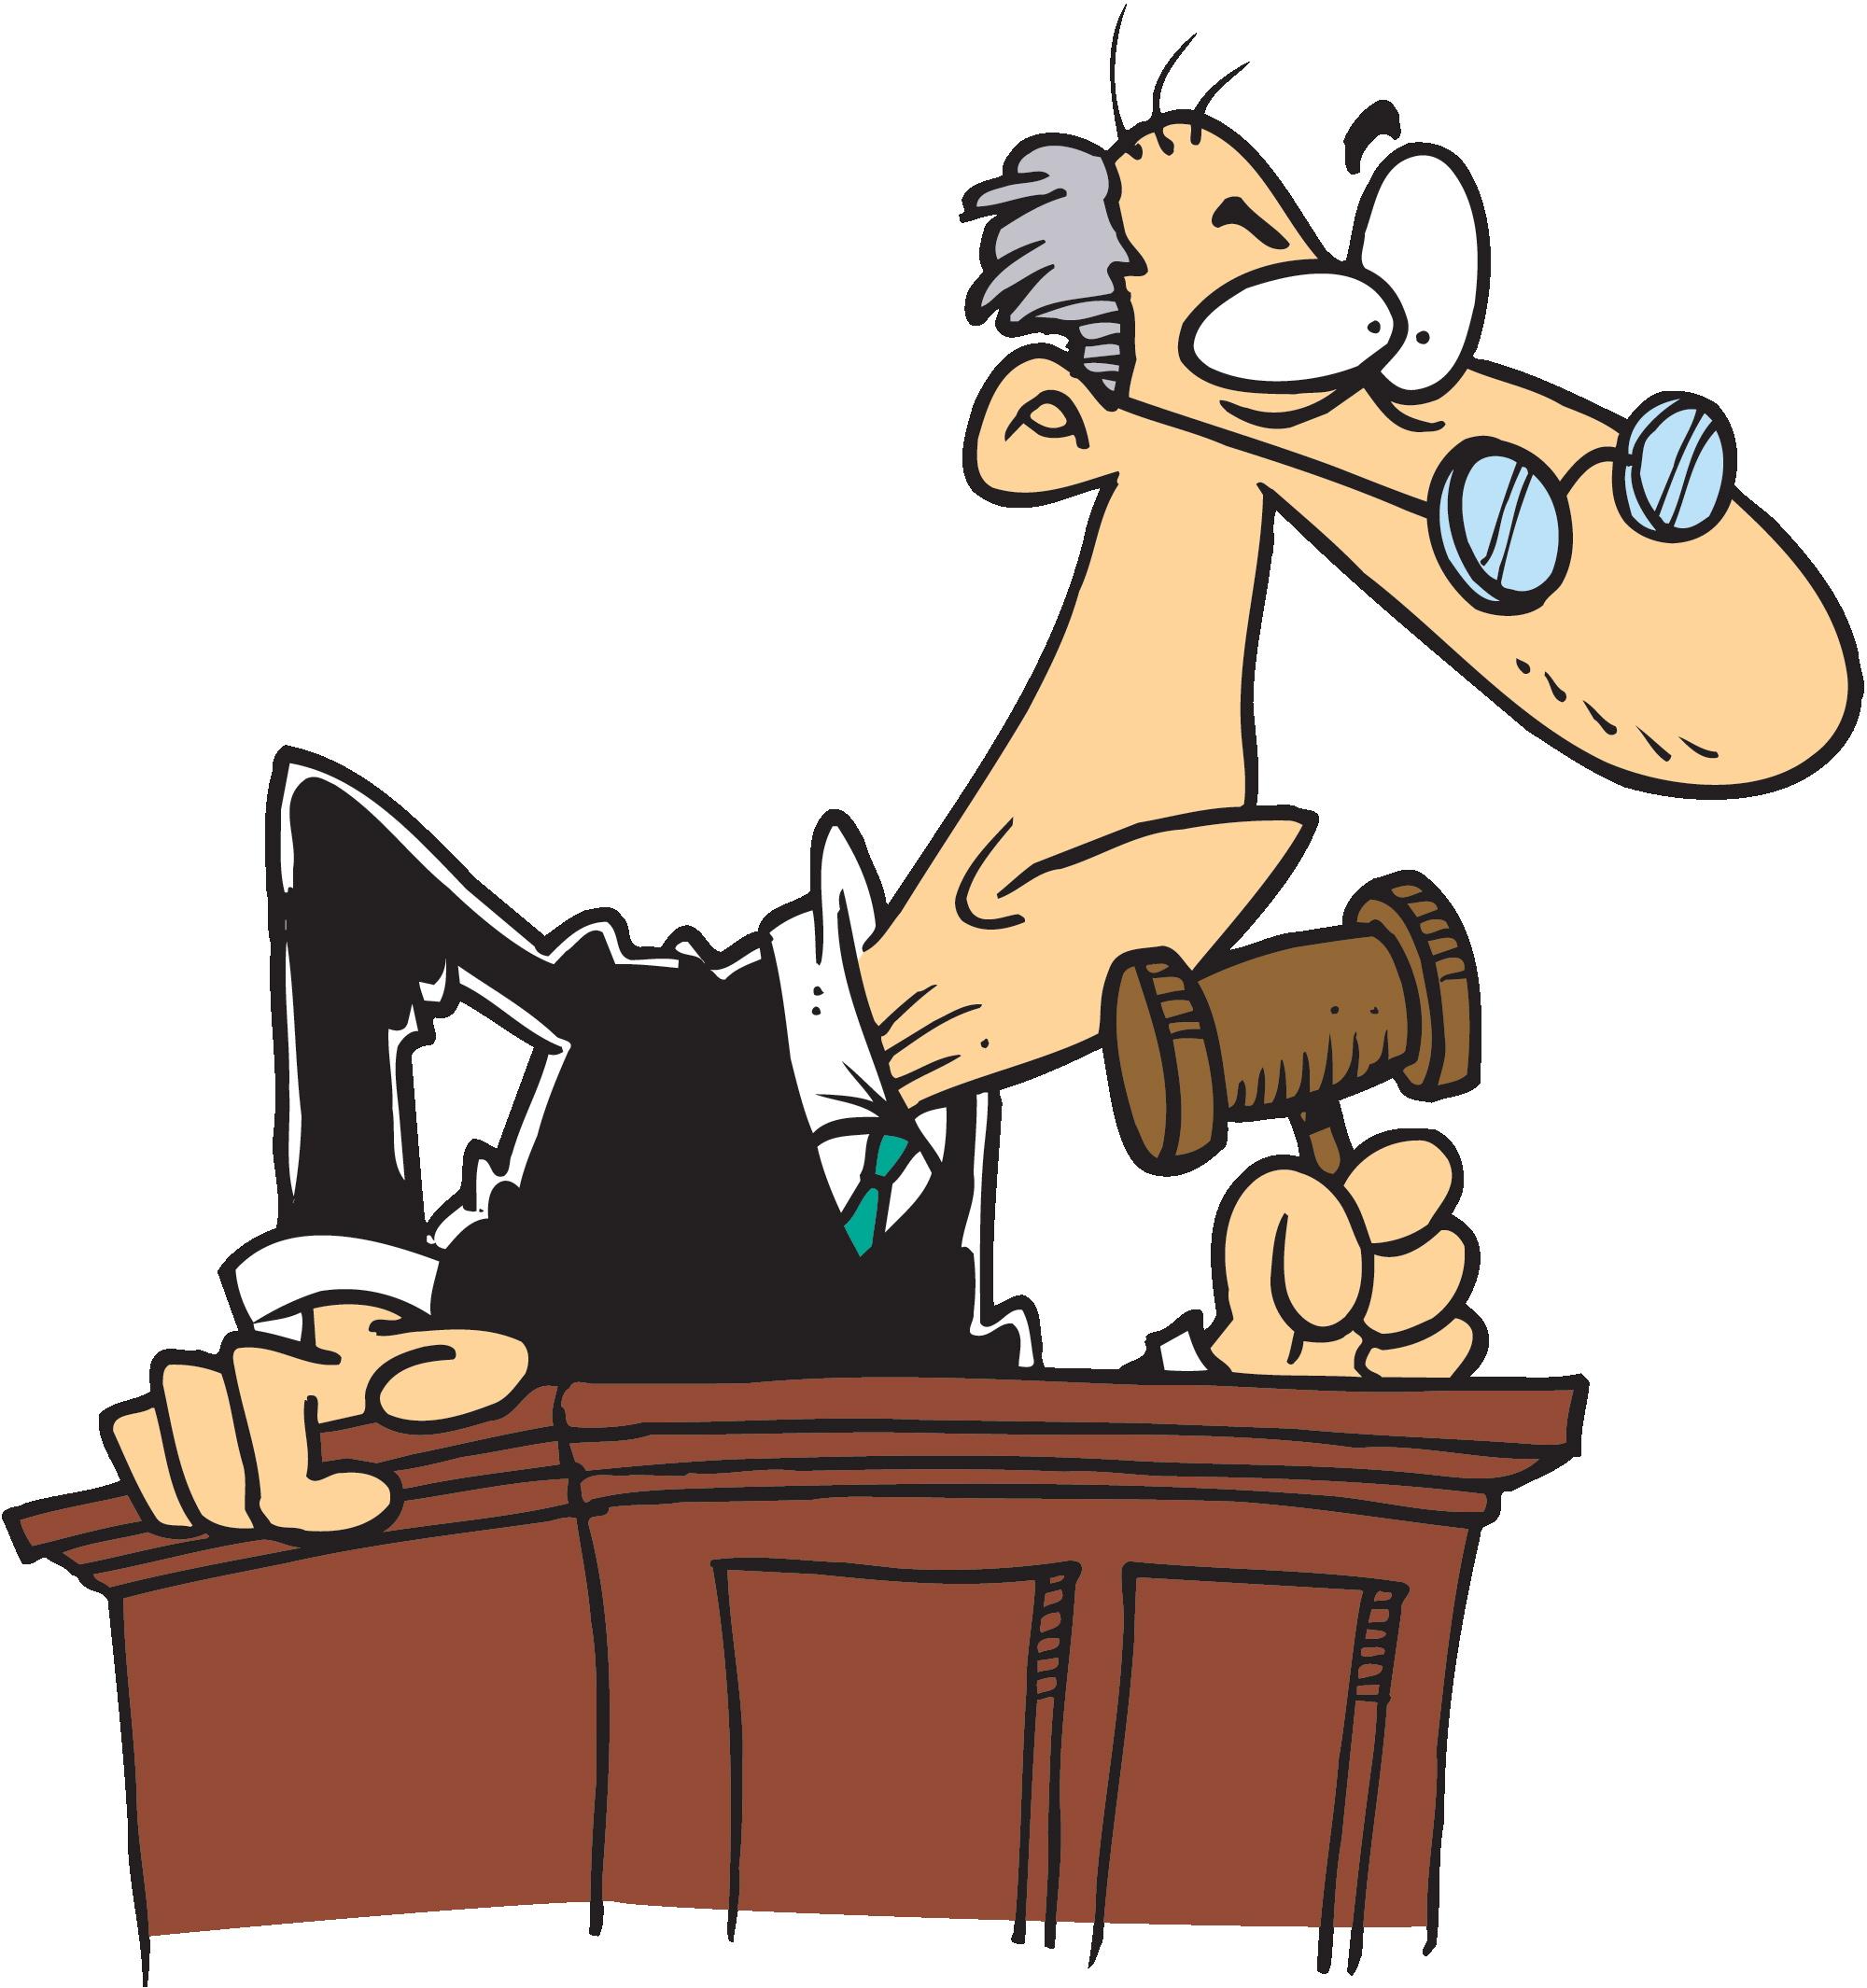 Free PNG Judge - 68613